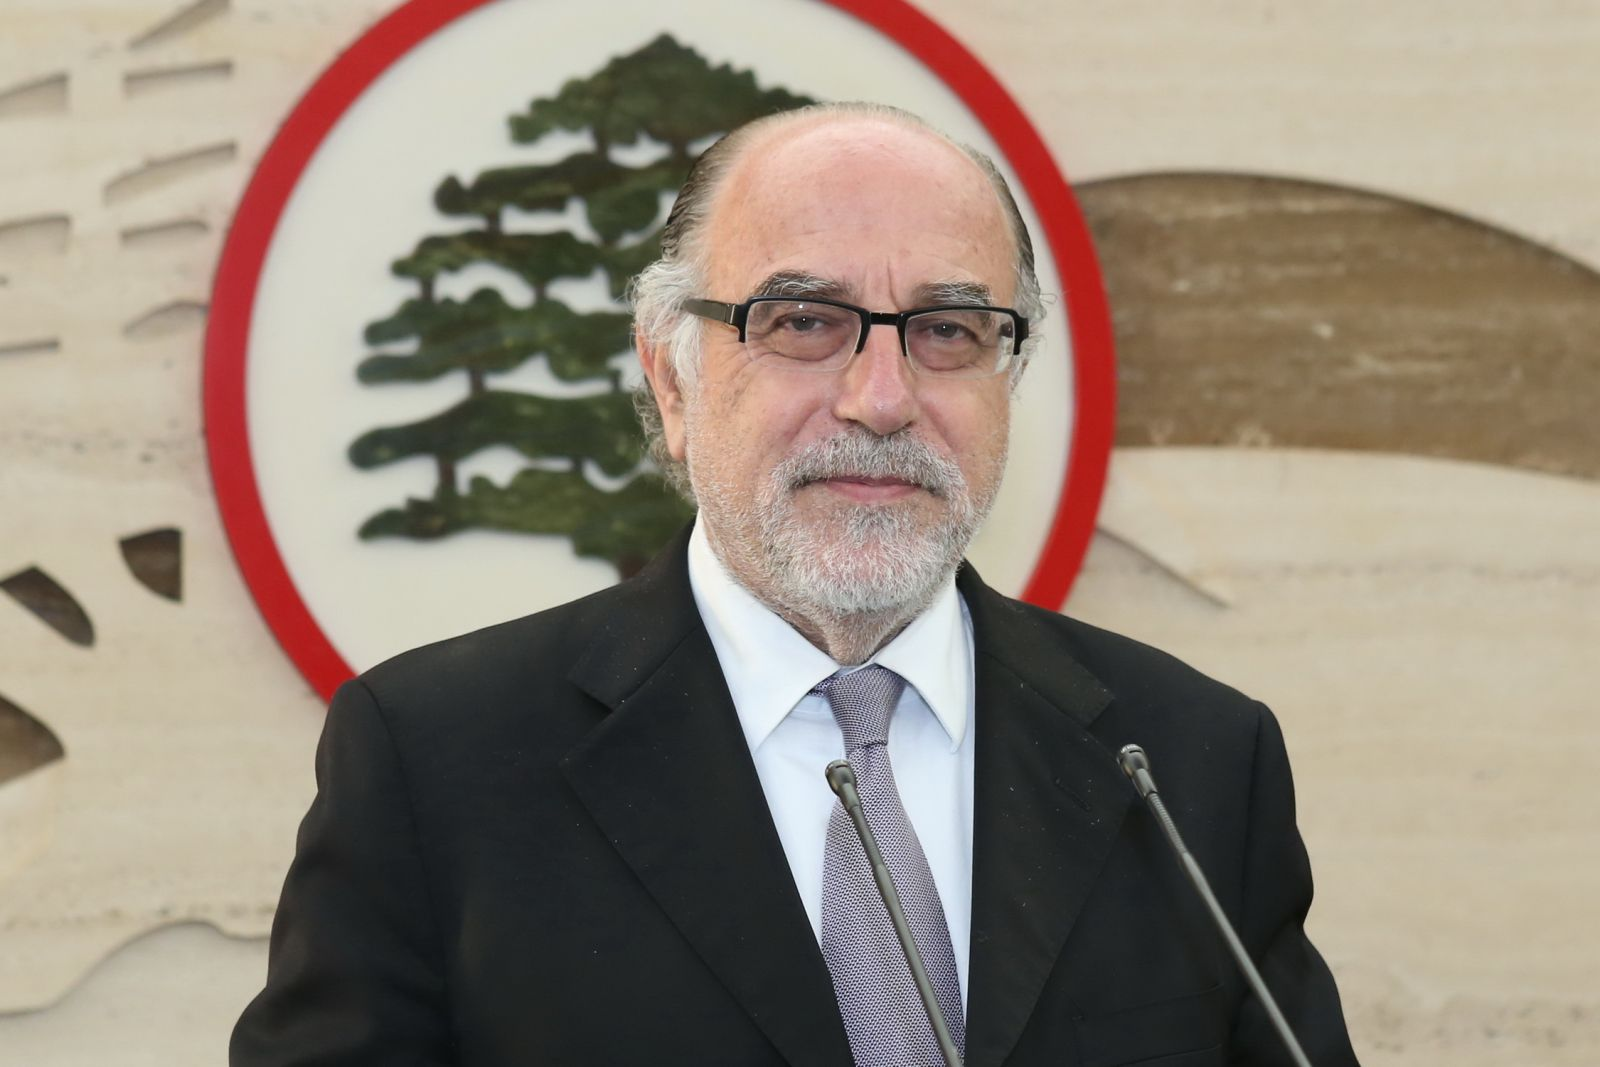 ������ ������ ������ ������ ���� ��� 2013